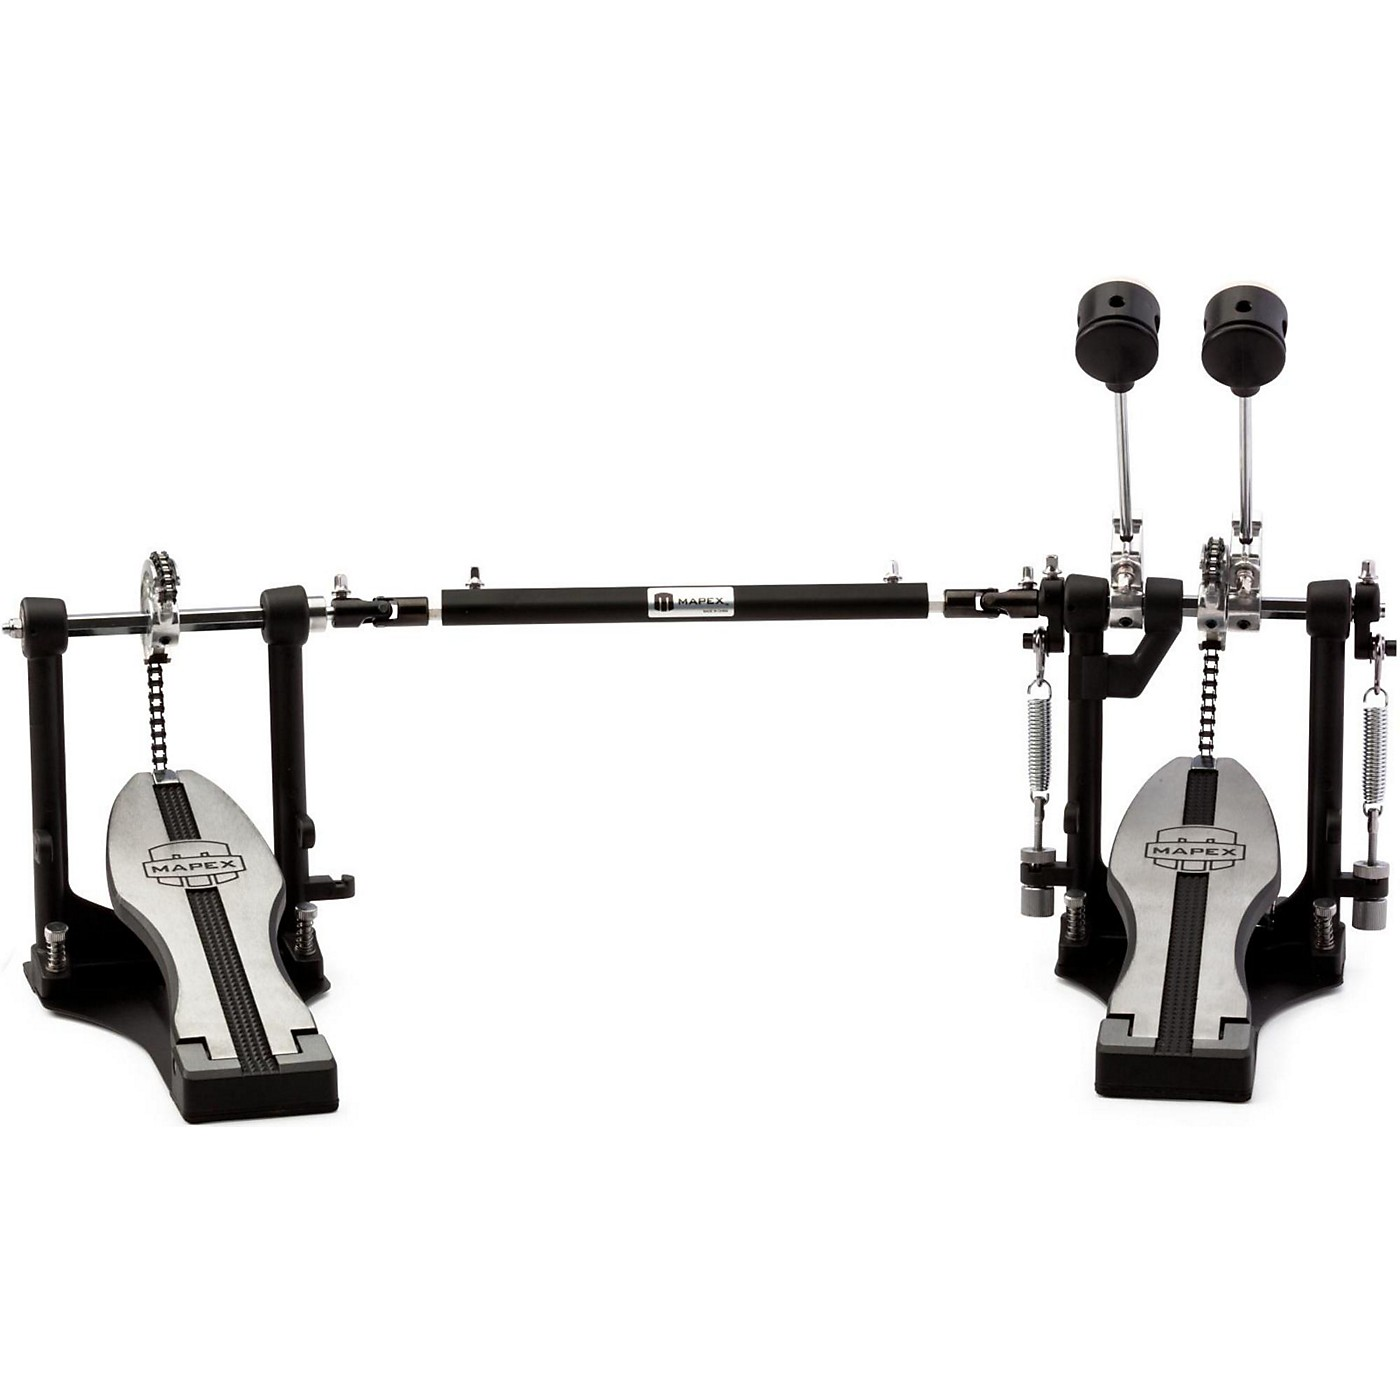 Mapex 400 Series P400TW Double Bass Drum Pedal thumbnail